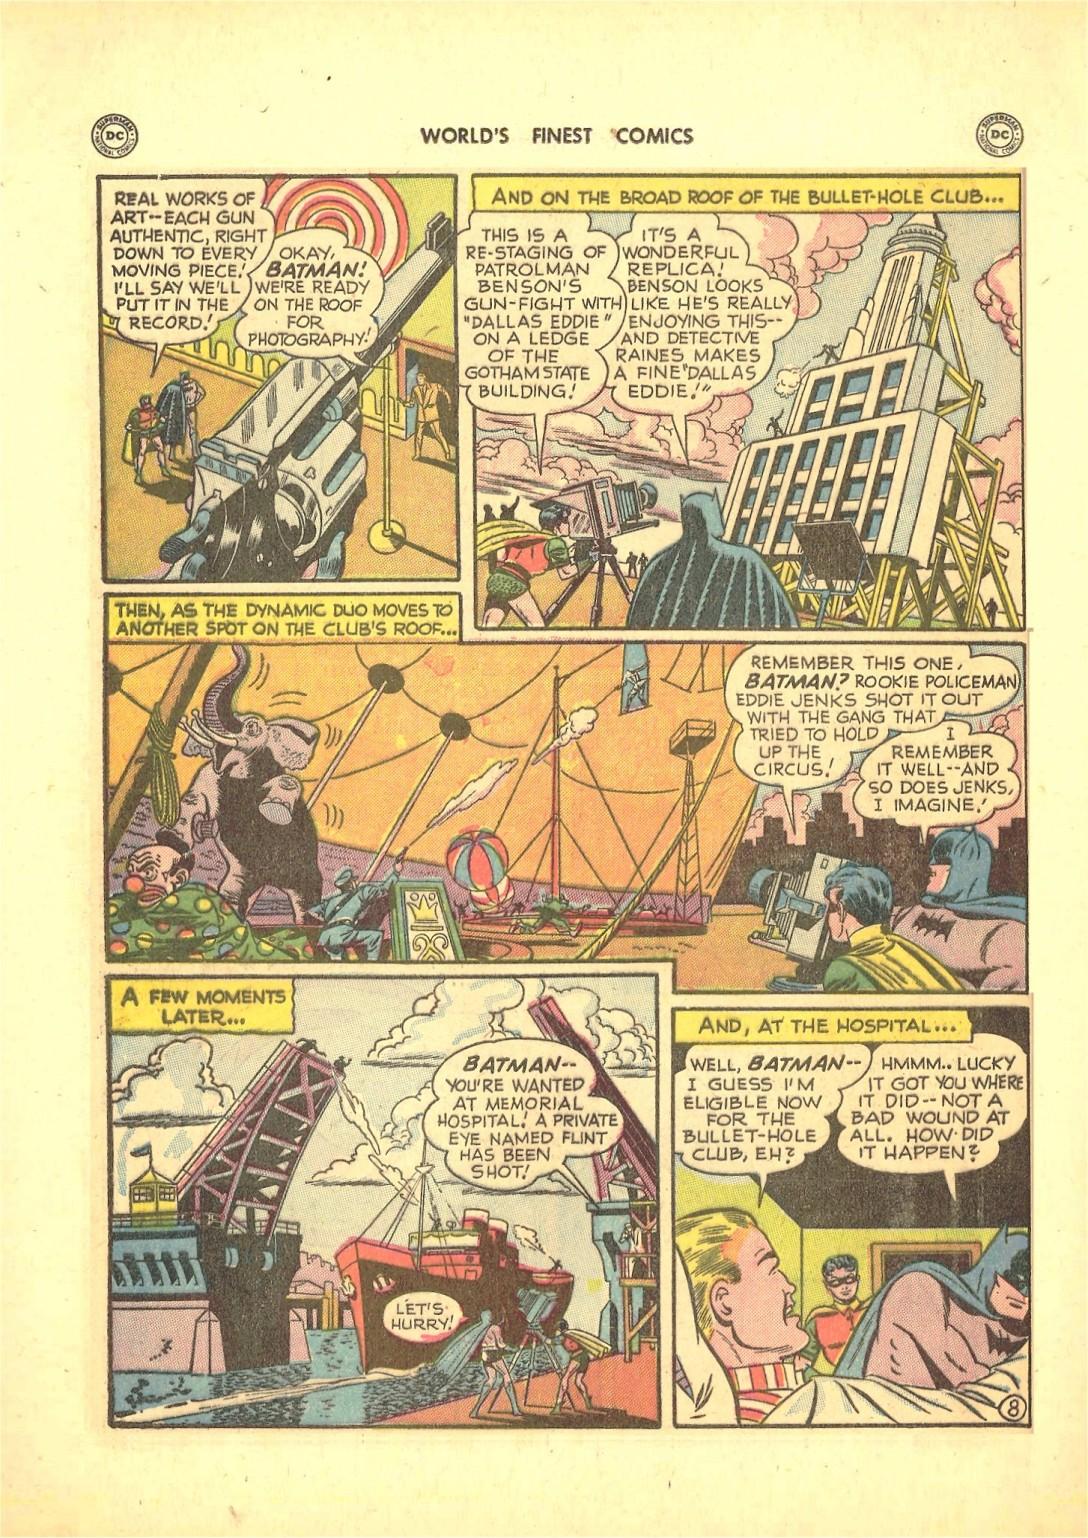 Read online World's Finest Comics comic -  Issue #50 - 70